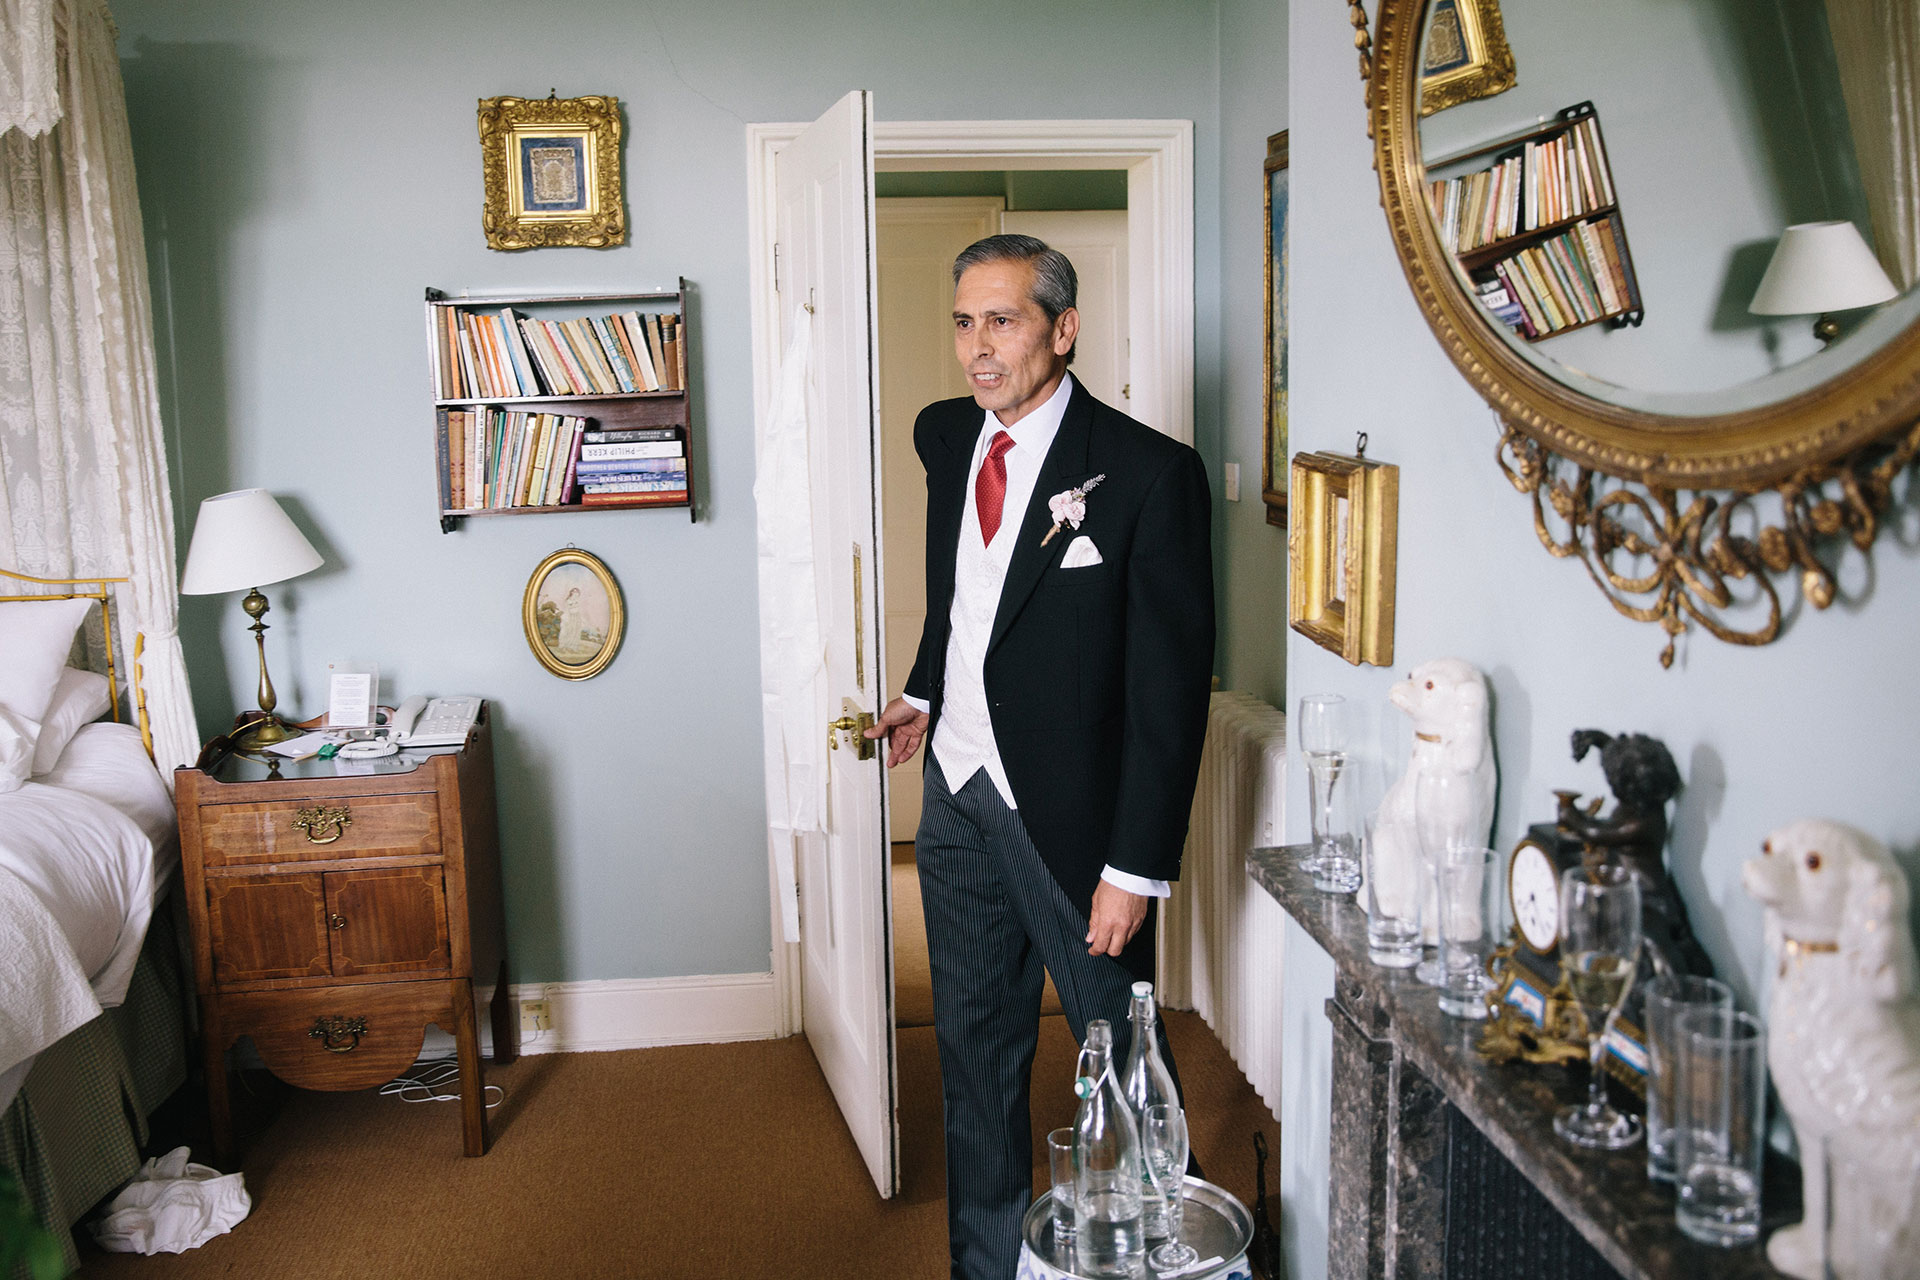 Langar-Hall-wedding-photographer-in-Nottinghamshire-Michael-Newington-Gray-23.jpg